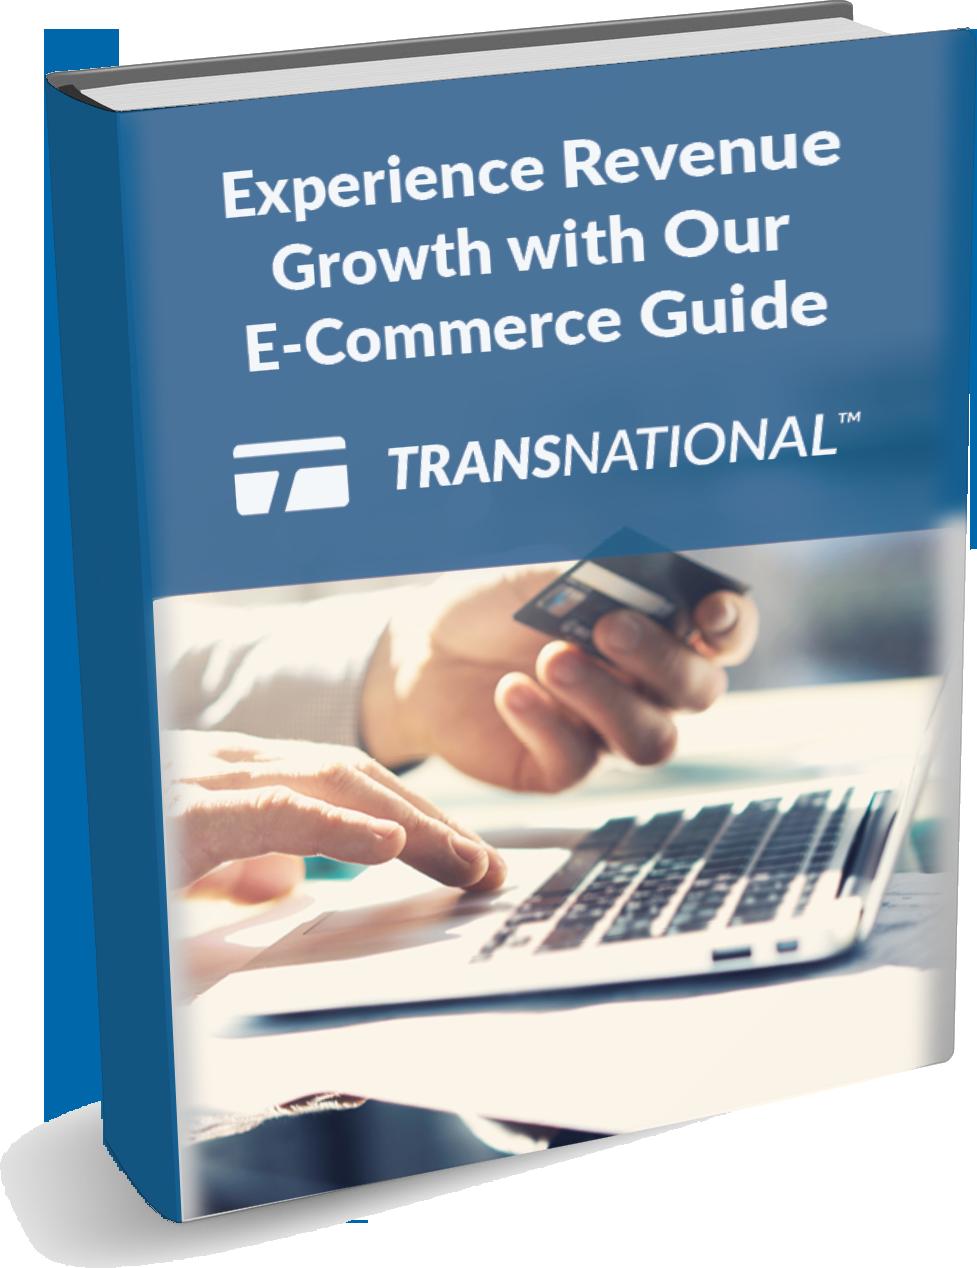 E-Commerce Guide - Payment Gateway